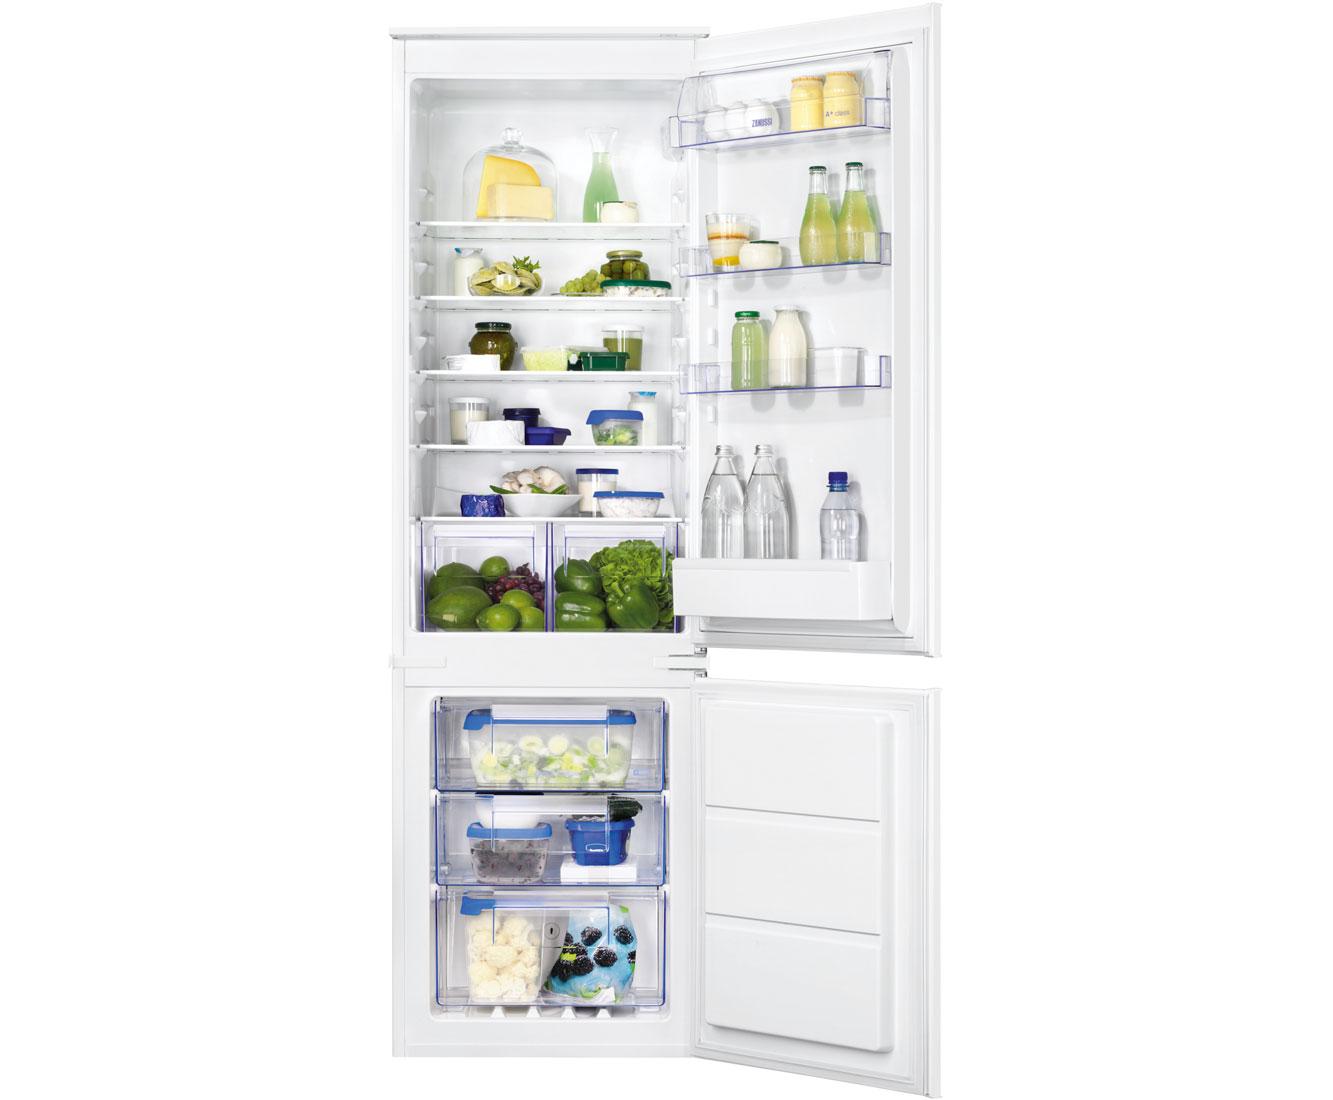 Zanussi ZBB28651SA Integrated Fridge Freezer Frost Free in White